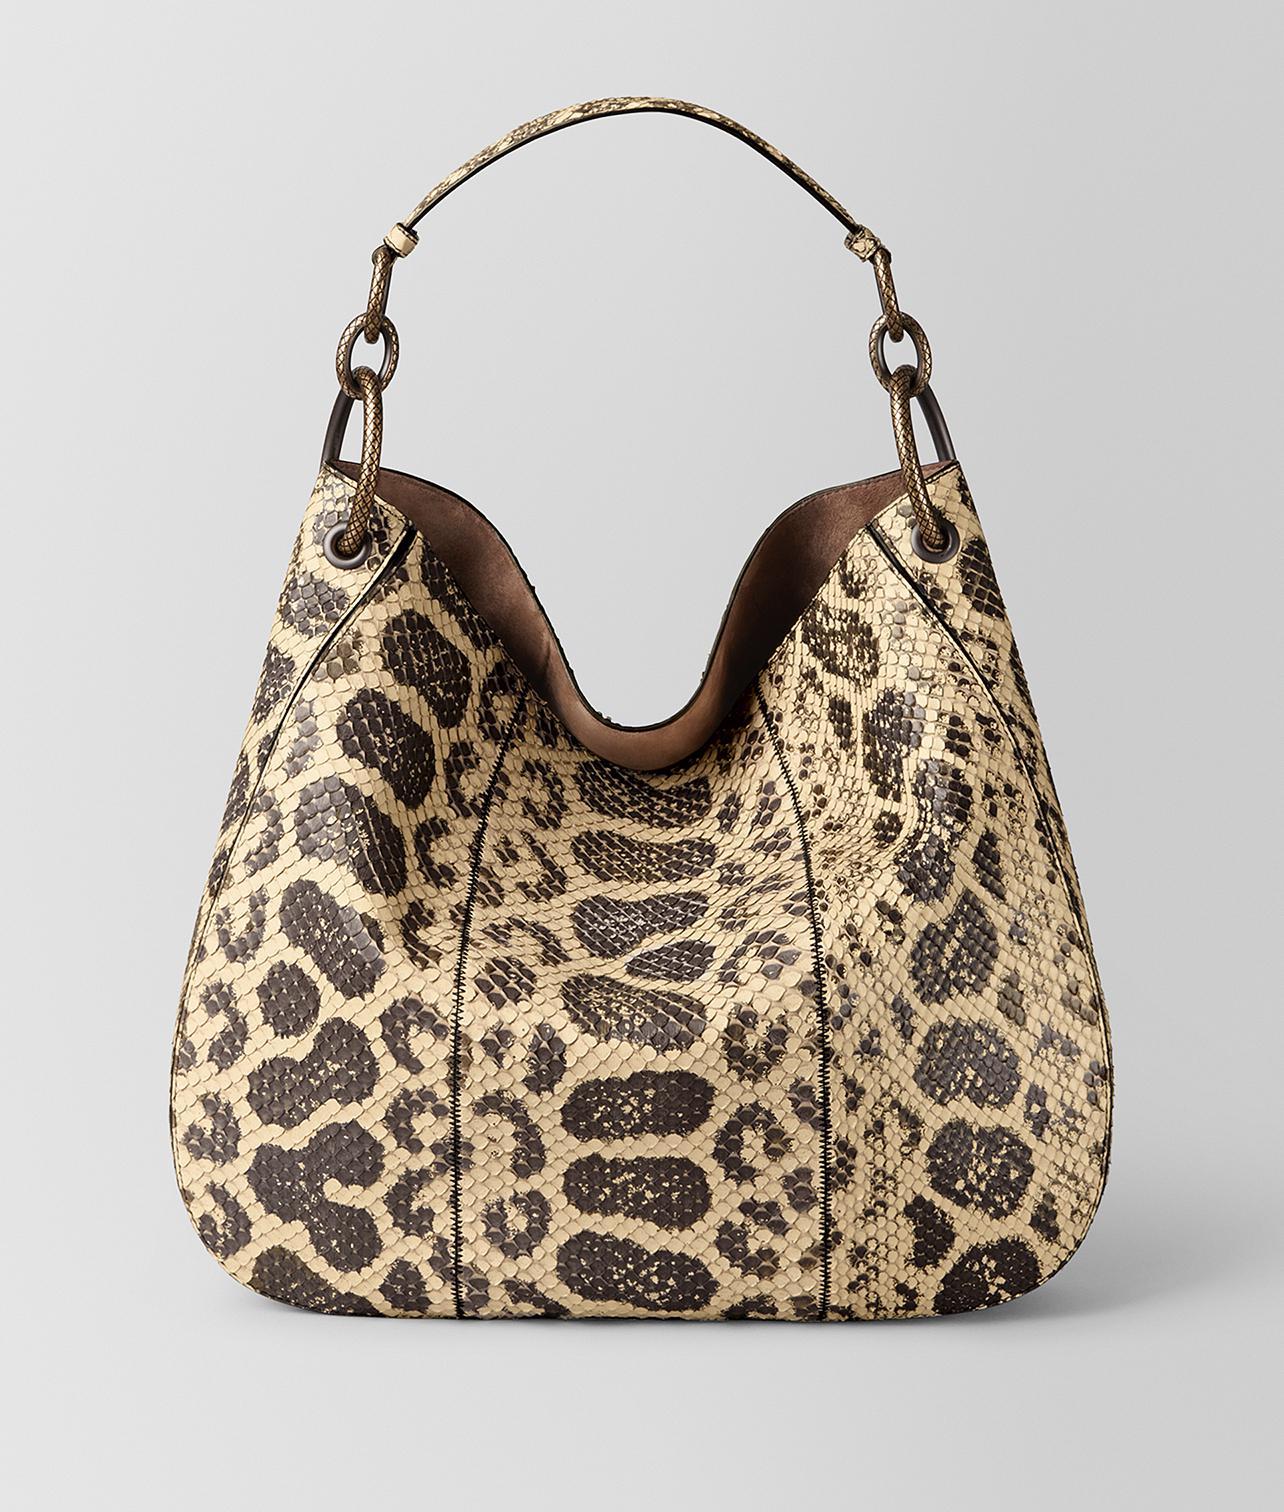 834da5b57a5 Bottega Veneta. Women s Natural Anaconda Loop Bag